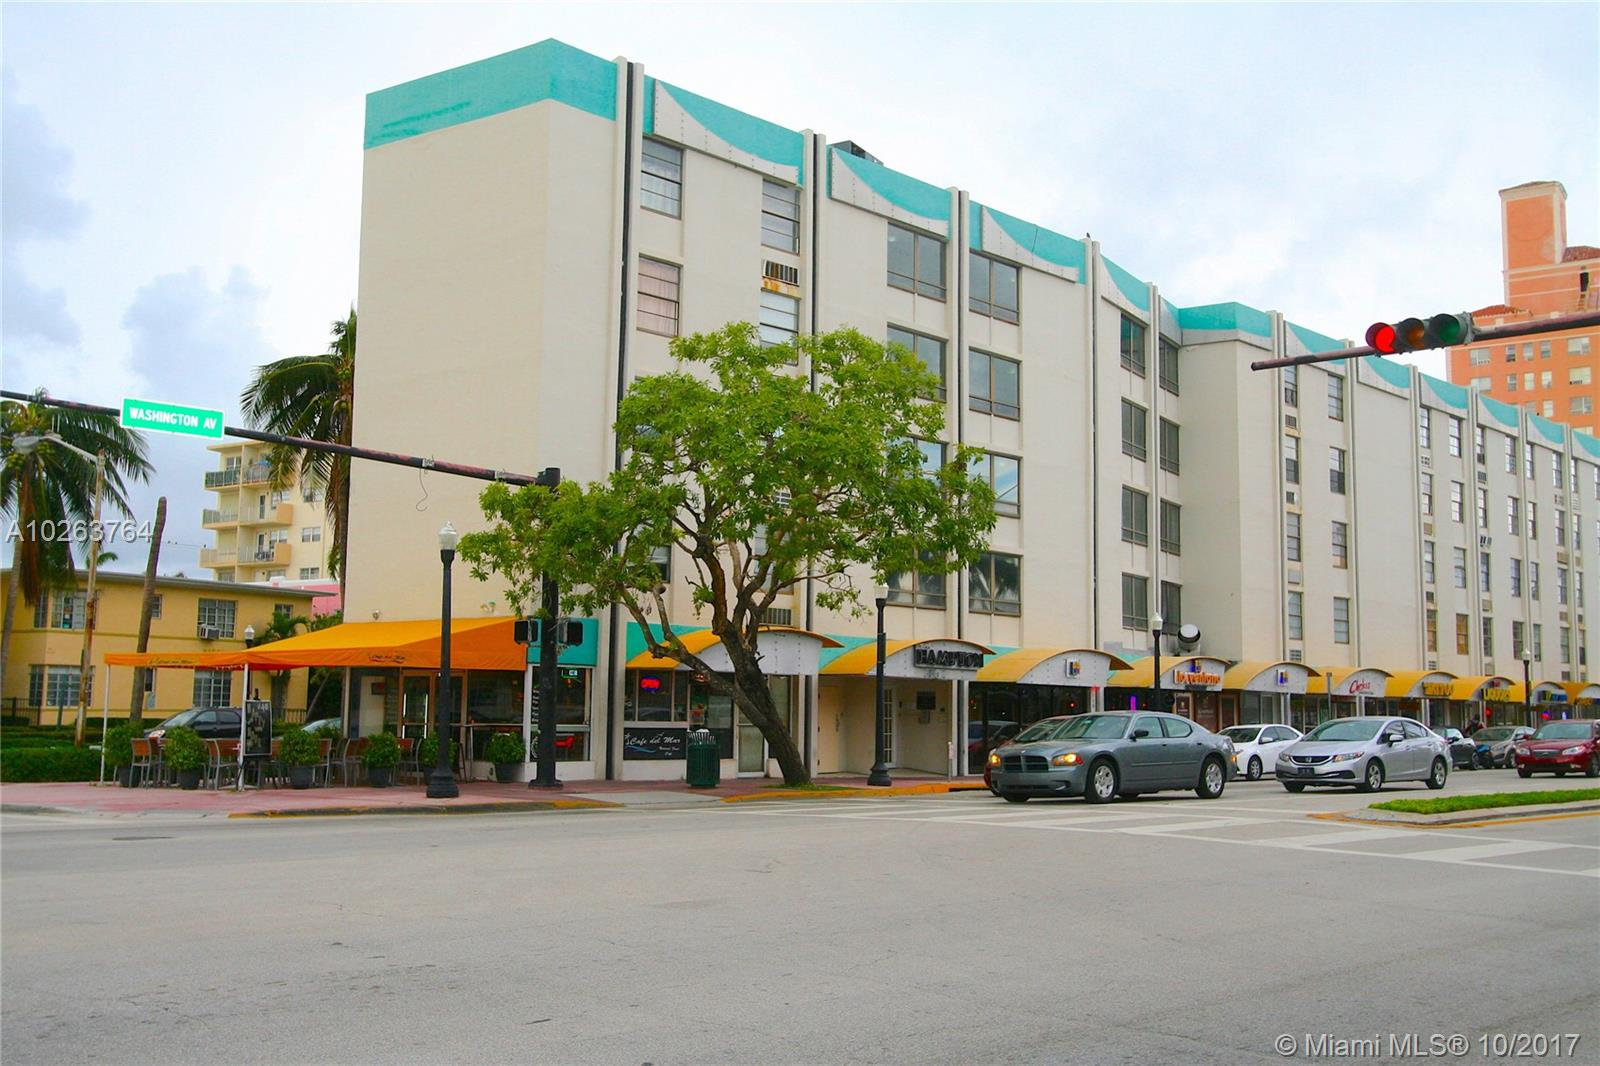 710 WASHINGTON AV # 405, Miami Beach, FL 33139